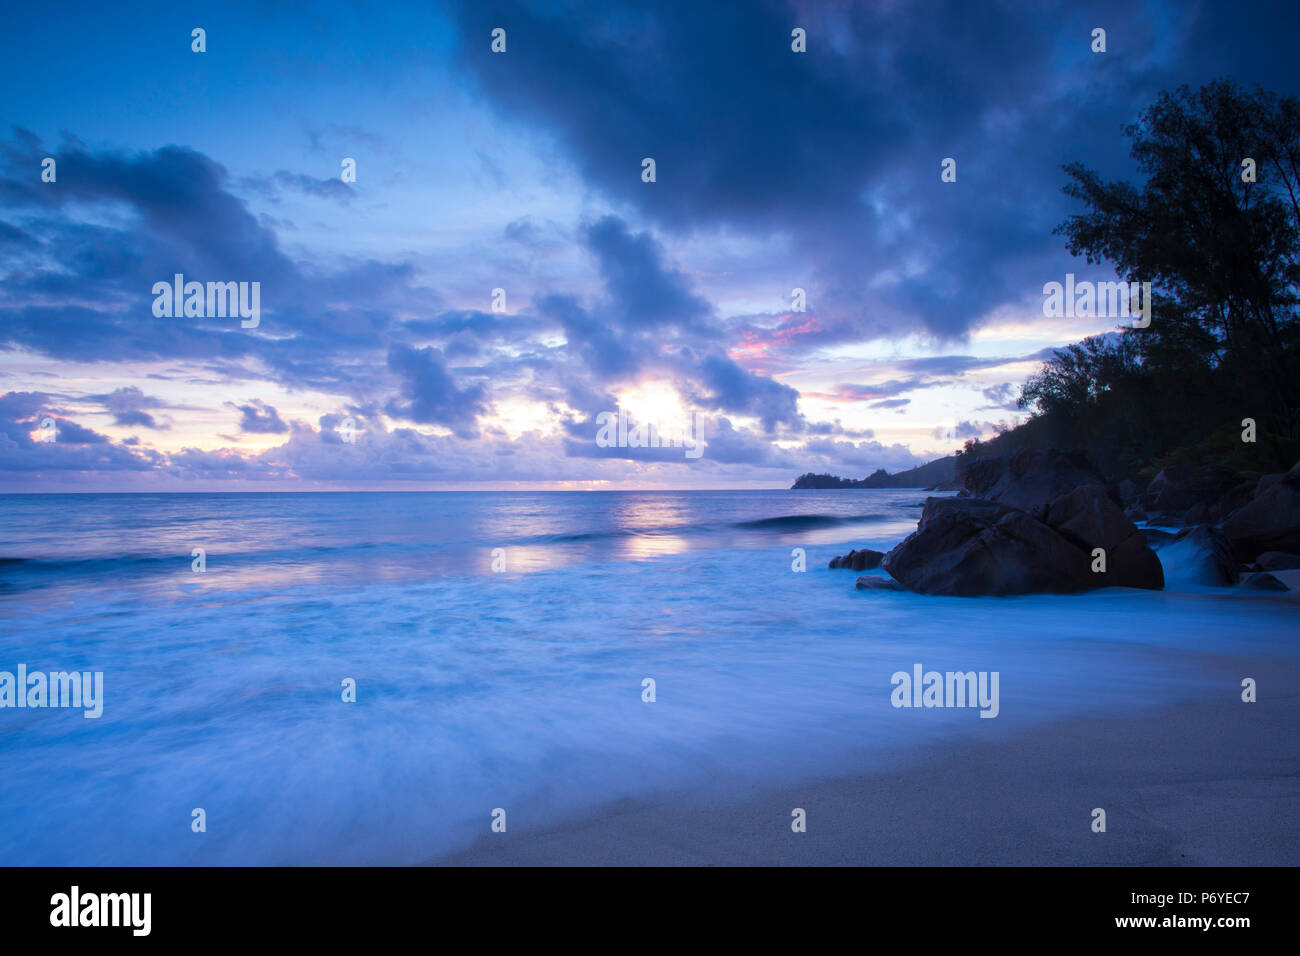 Tropical beach, Mahe island, Seychelles - Stock Image